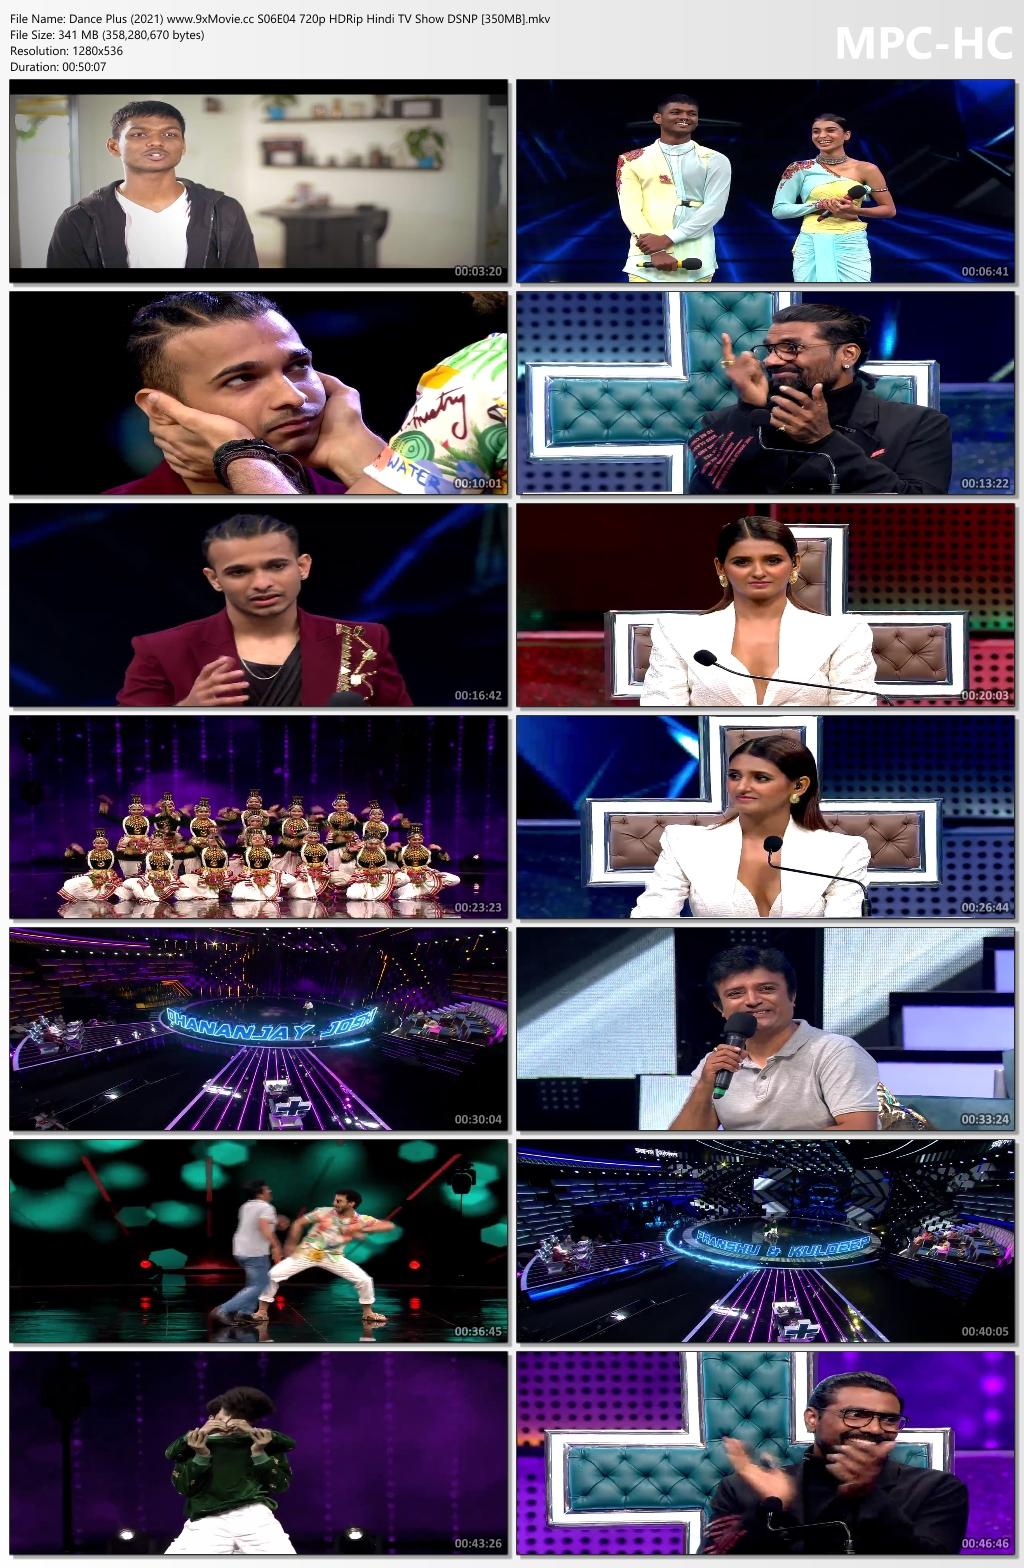 Dance-Plus-2021-www-9x-Movie-cc-S06-E04-720p-HDRip-Hindi-TV-Show-DSNP-350-MB-mkv